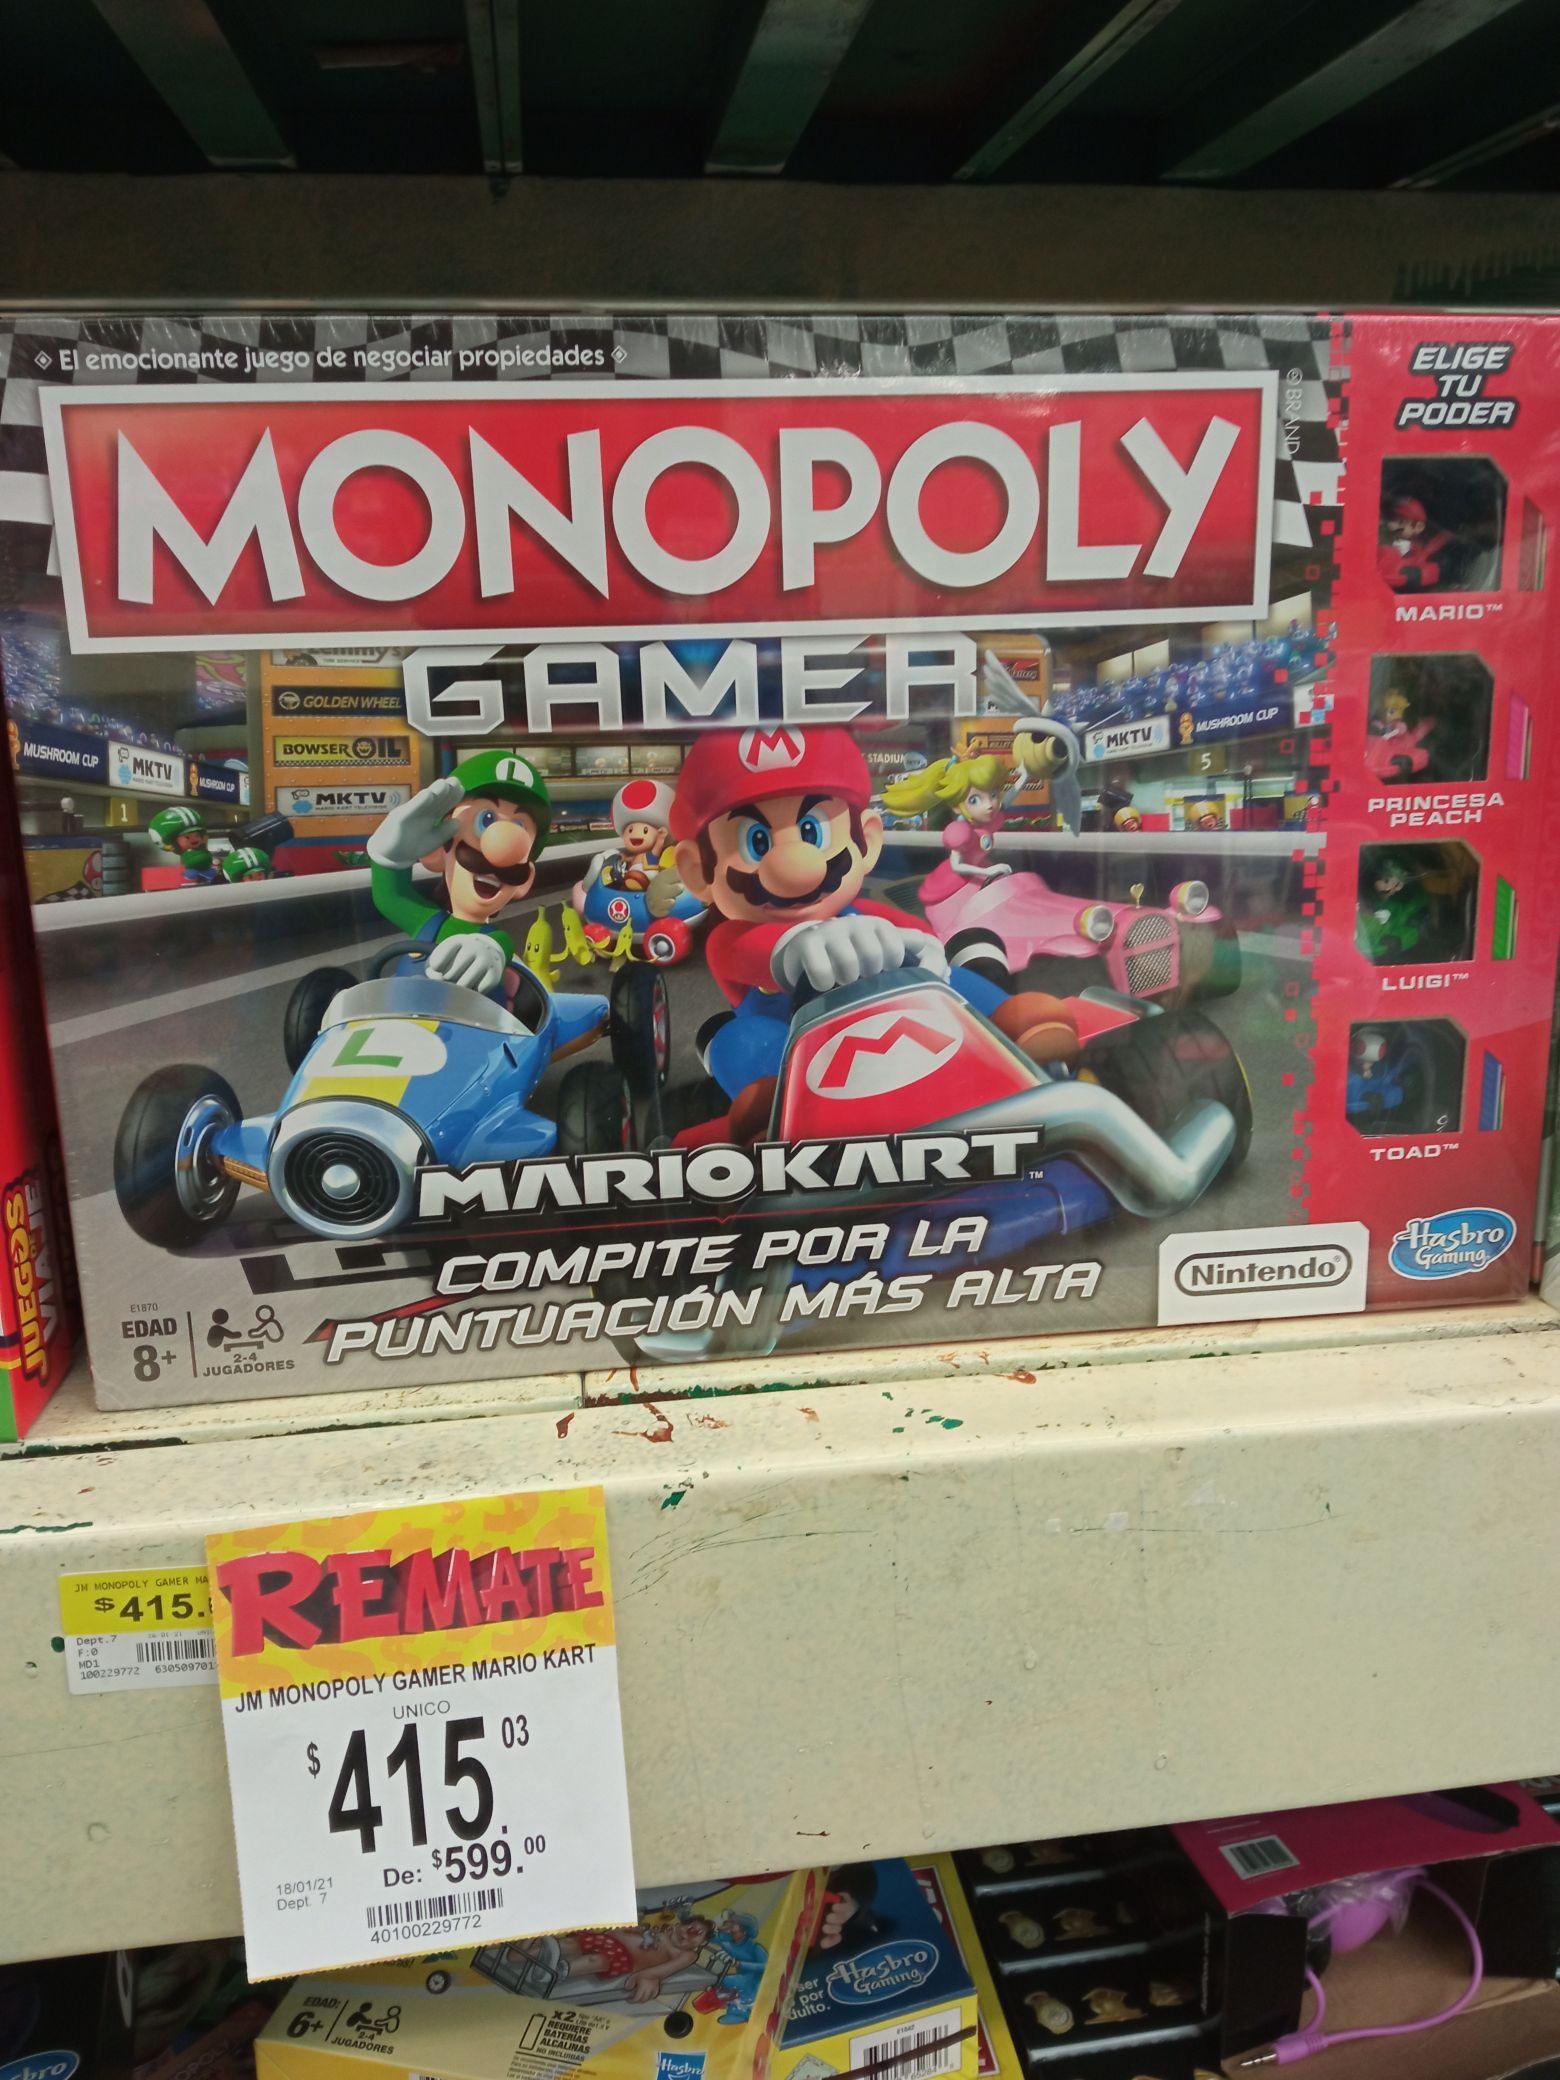 Bodega Aurrerá: Mario kart monopoly